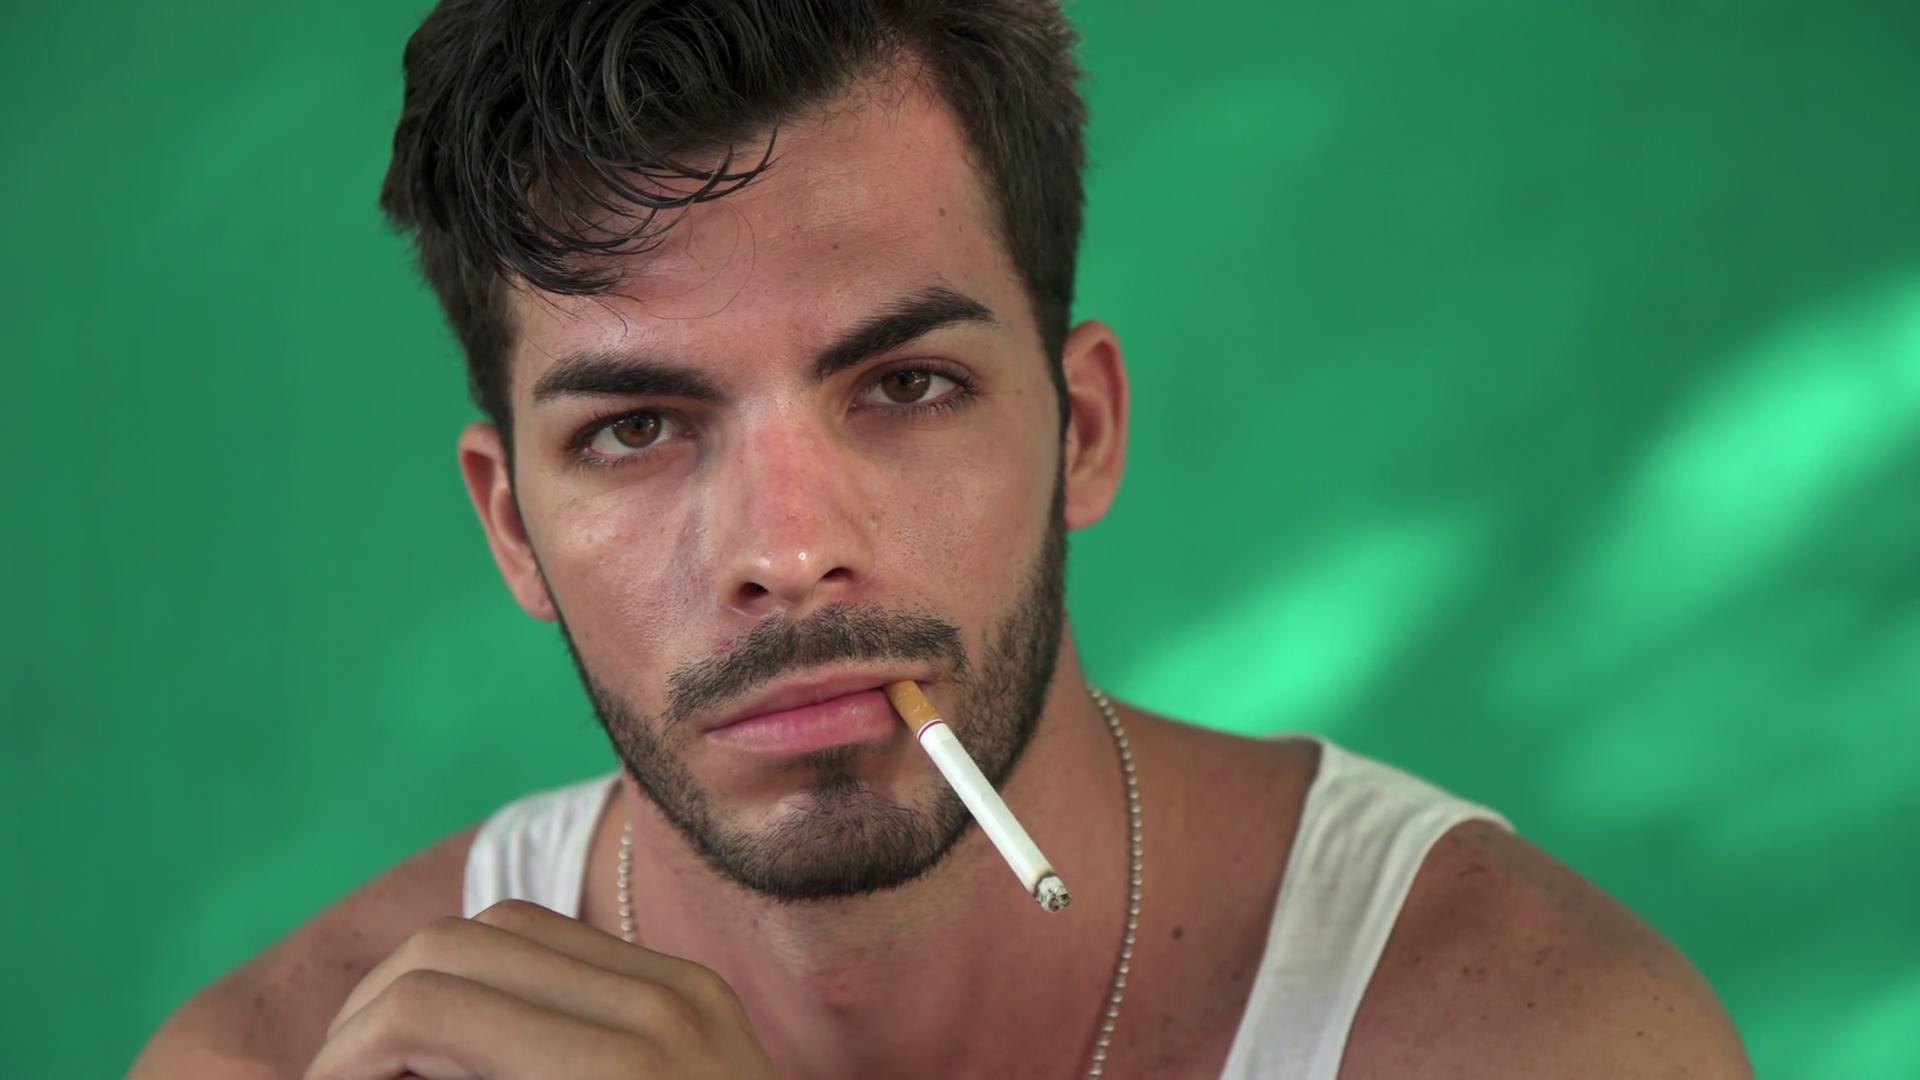 Young Hispanic Man Smoking Cigarette And Blowing Smoke